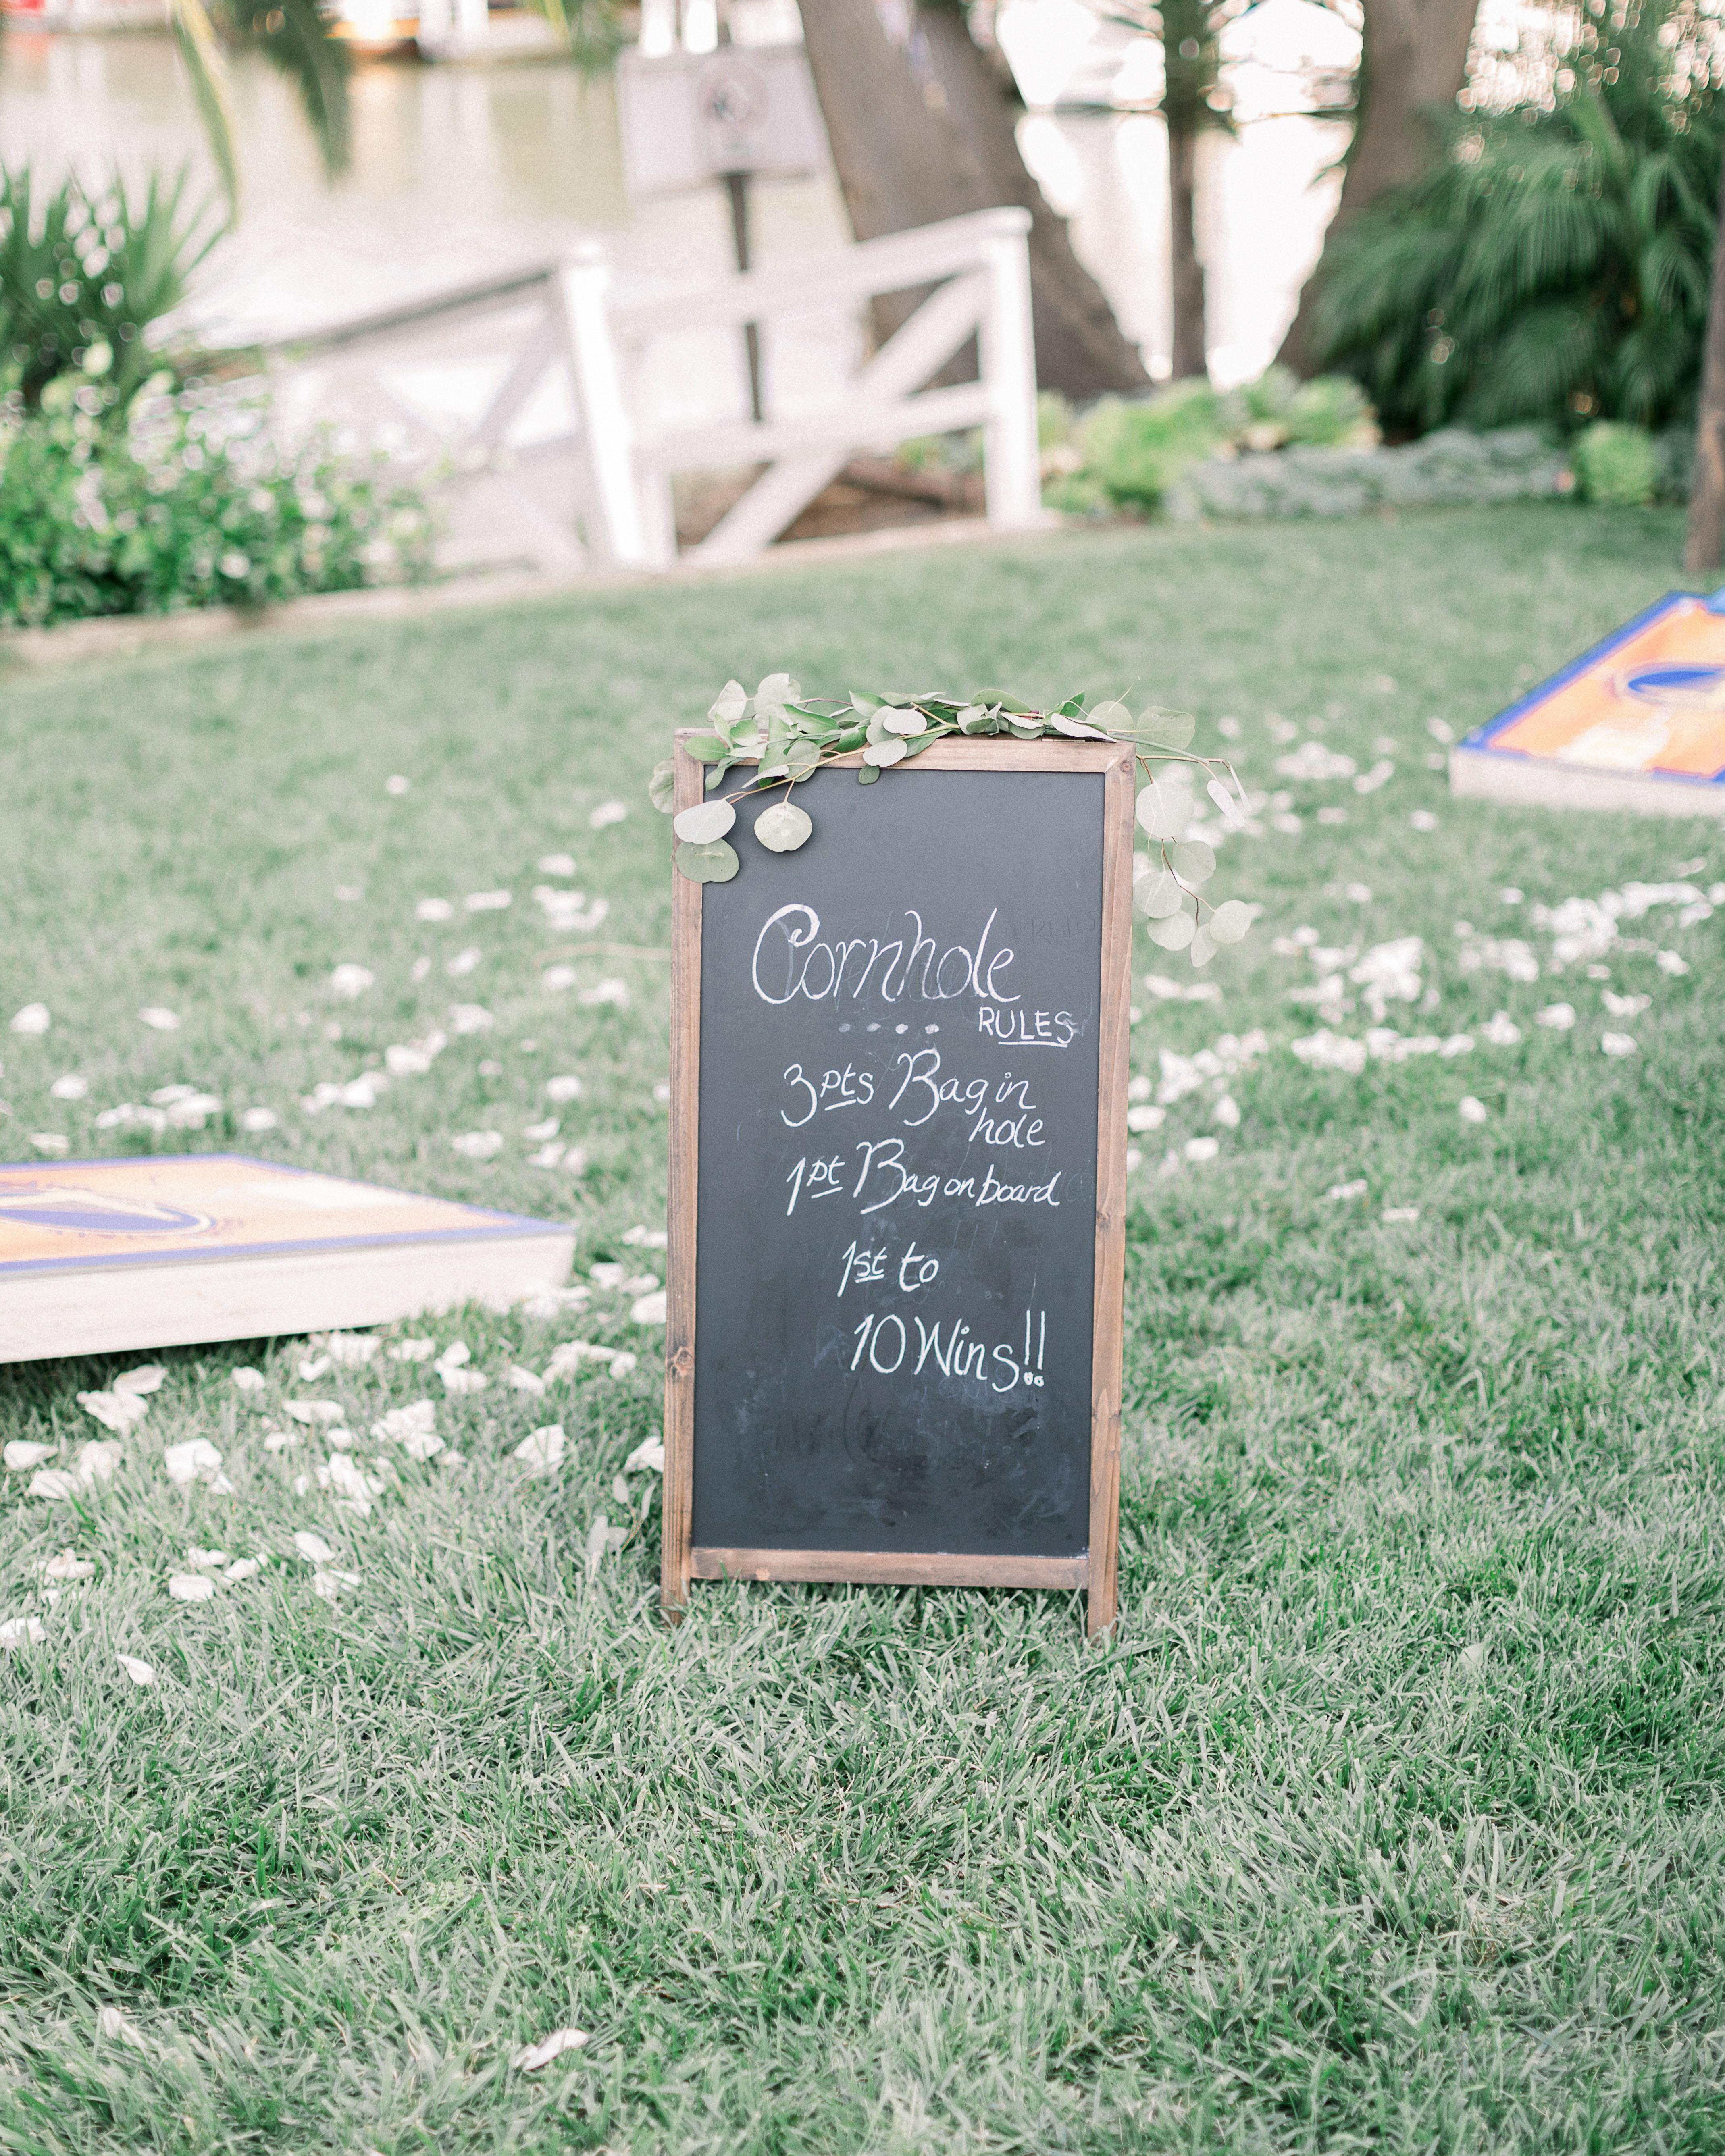 wedding lawn games chalkboard cornhole rules